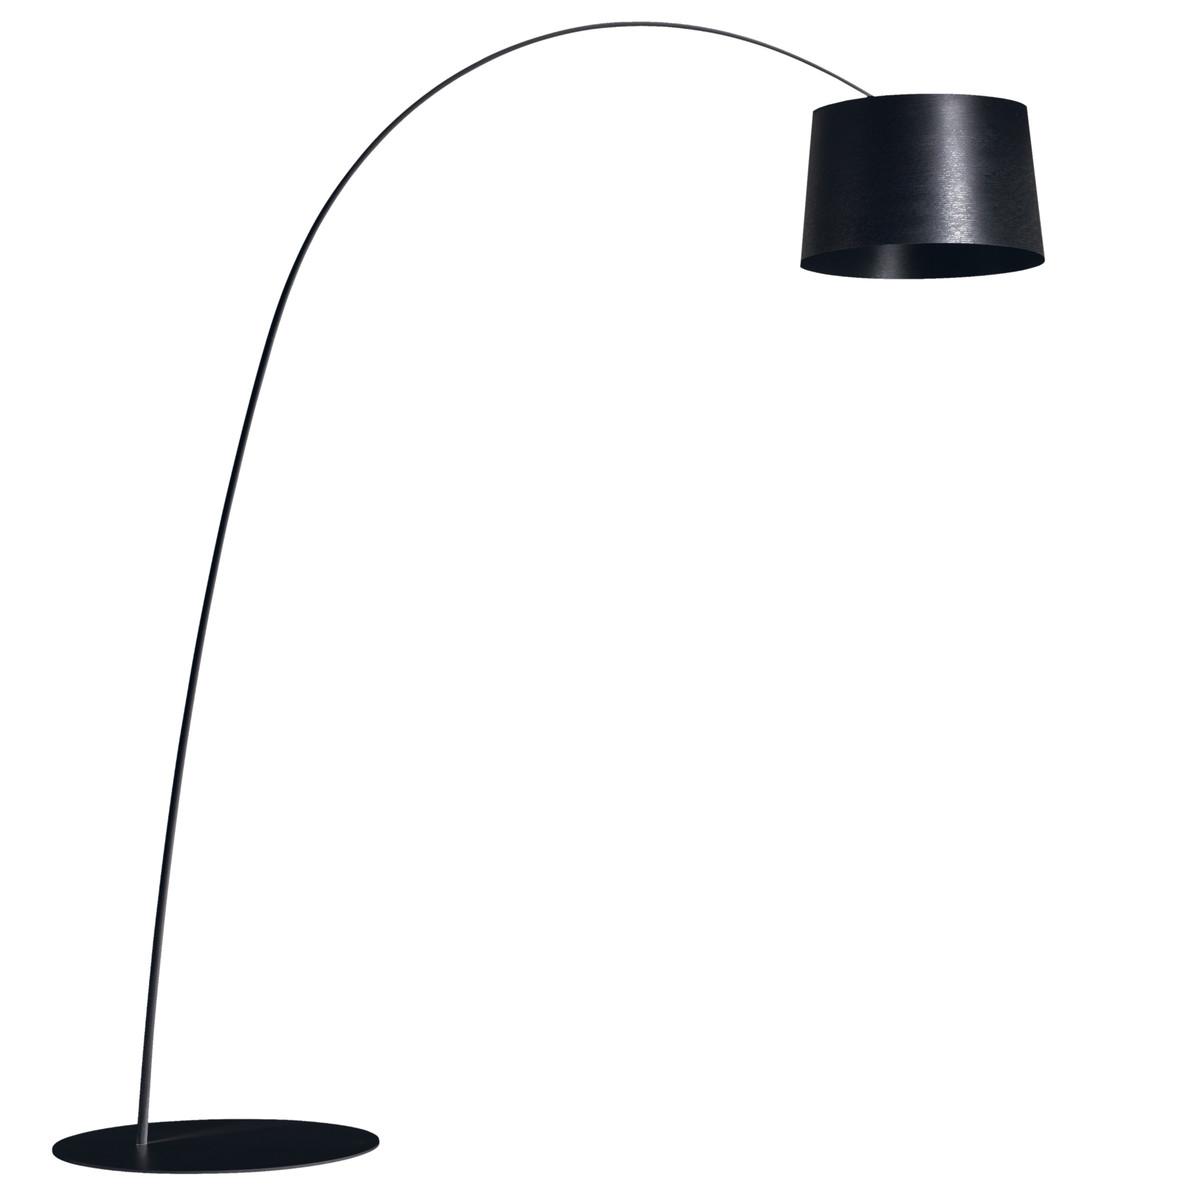 Gooseneck Floor Lamp Home Decor